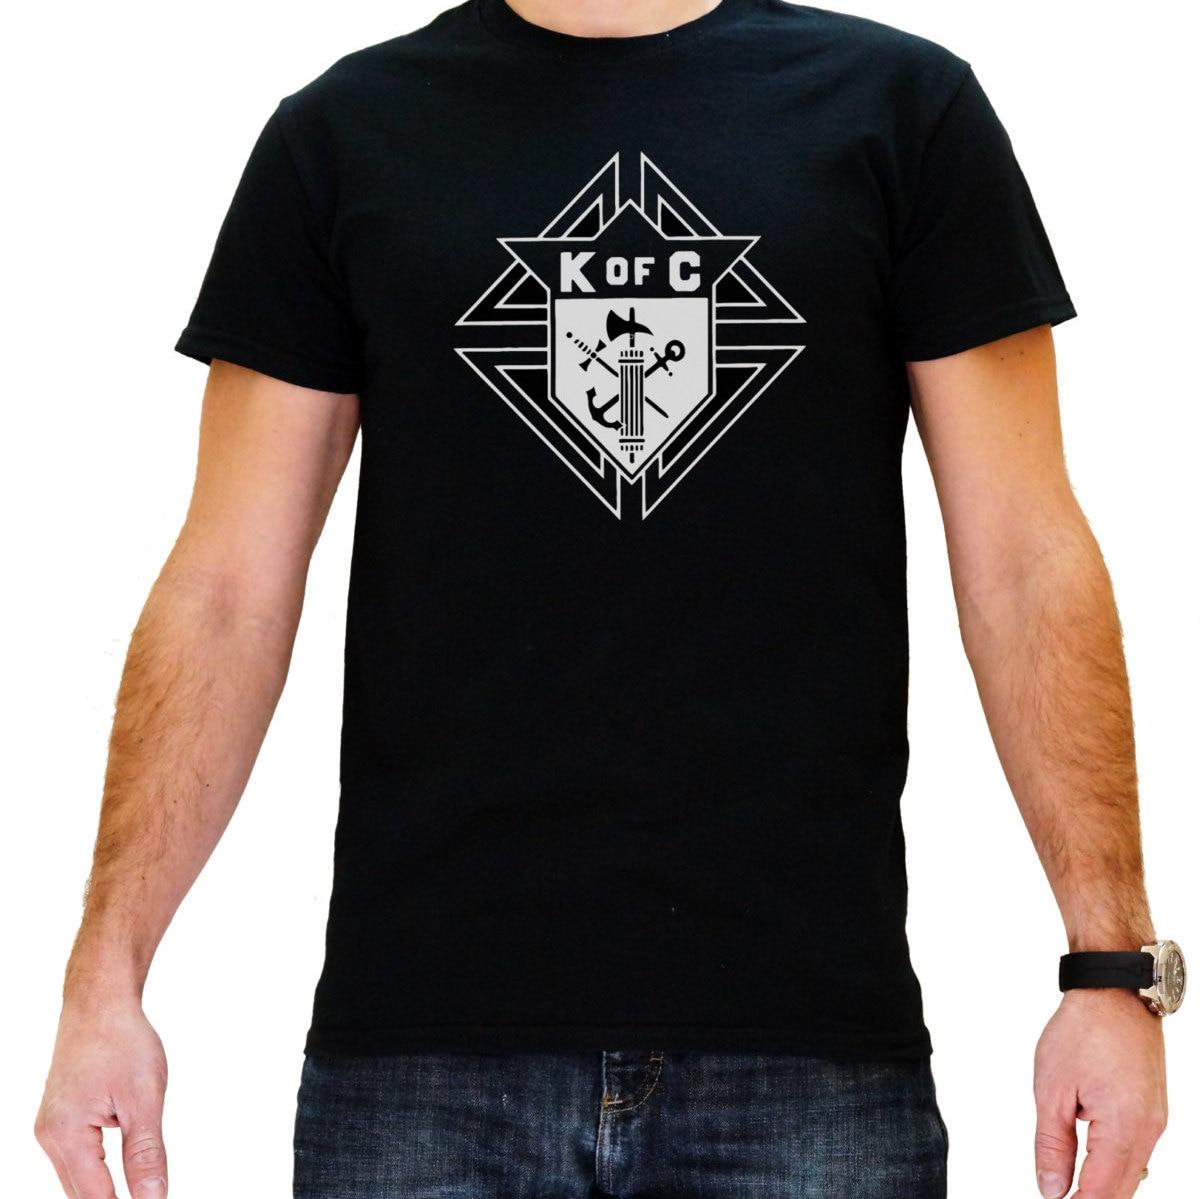 Knights of columbus men 39 s black masonic t shirt by for Mason s men s shirts